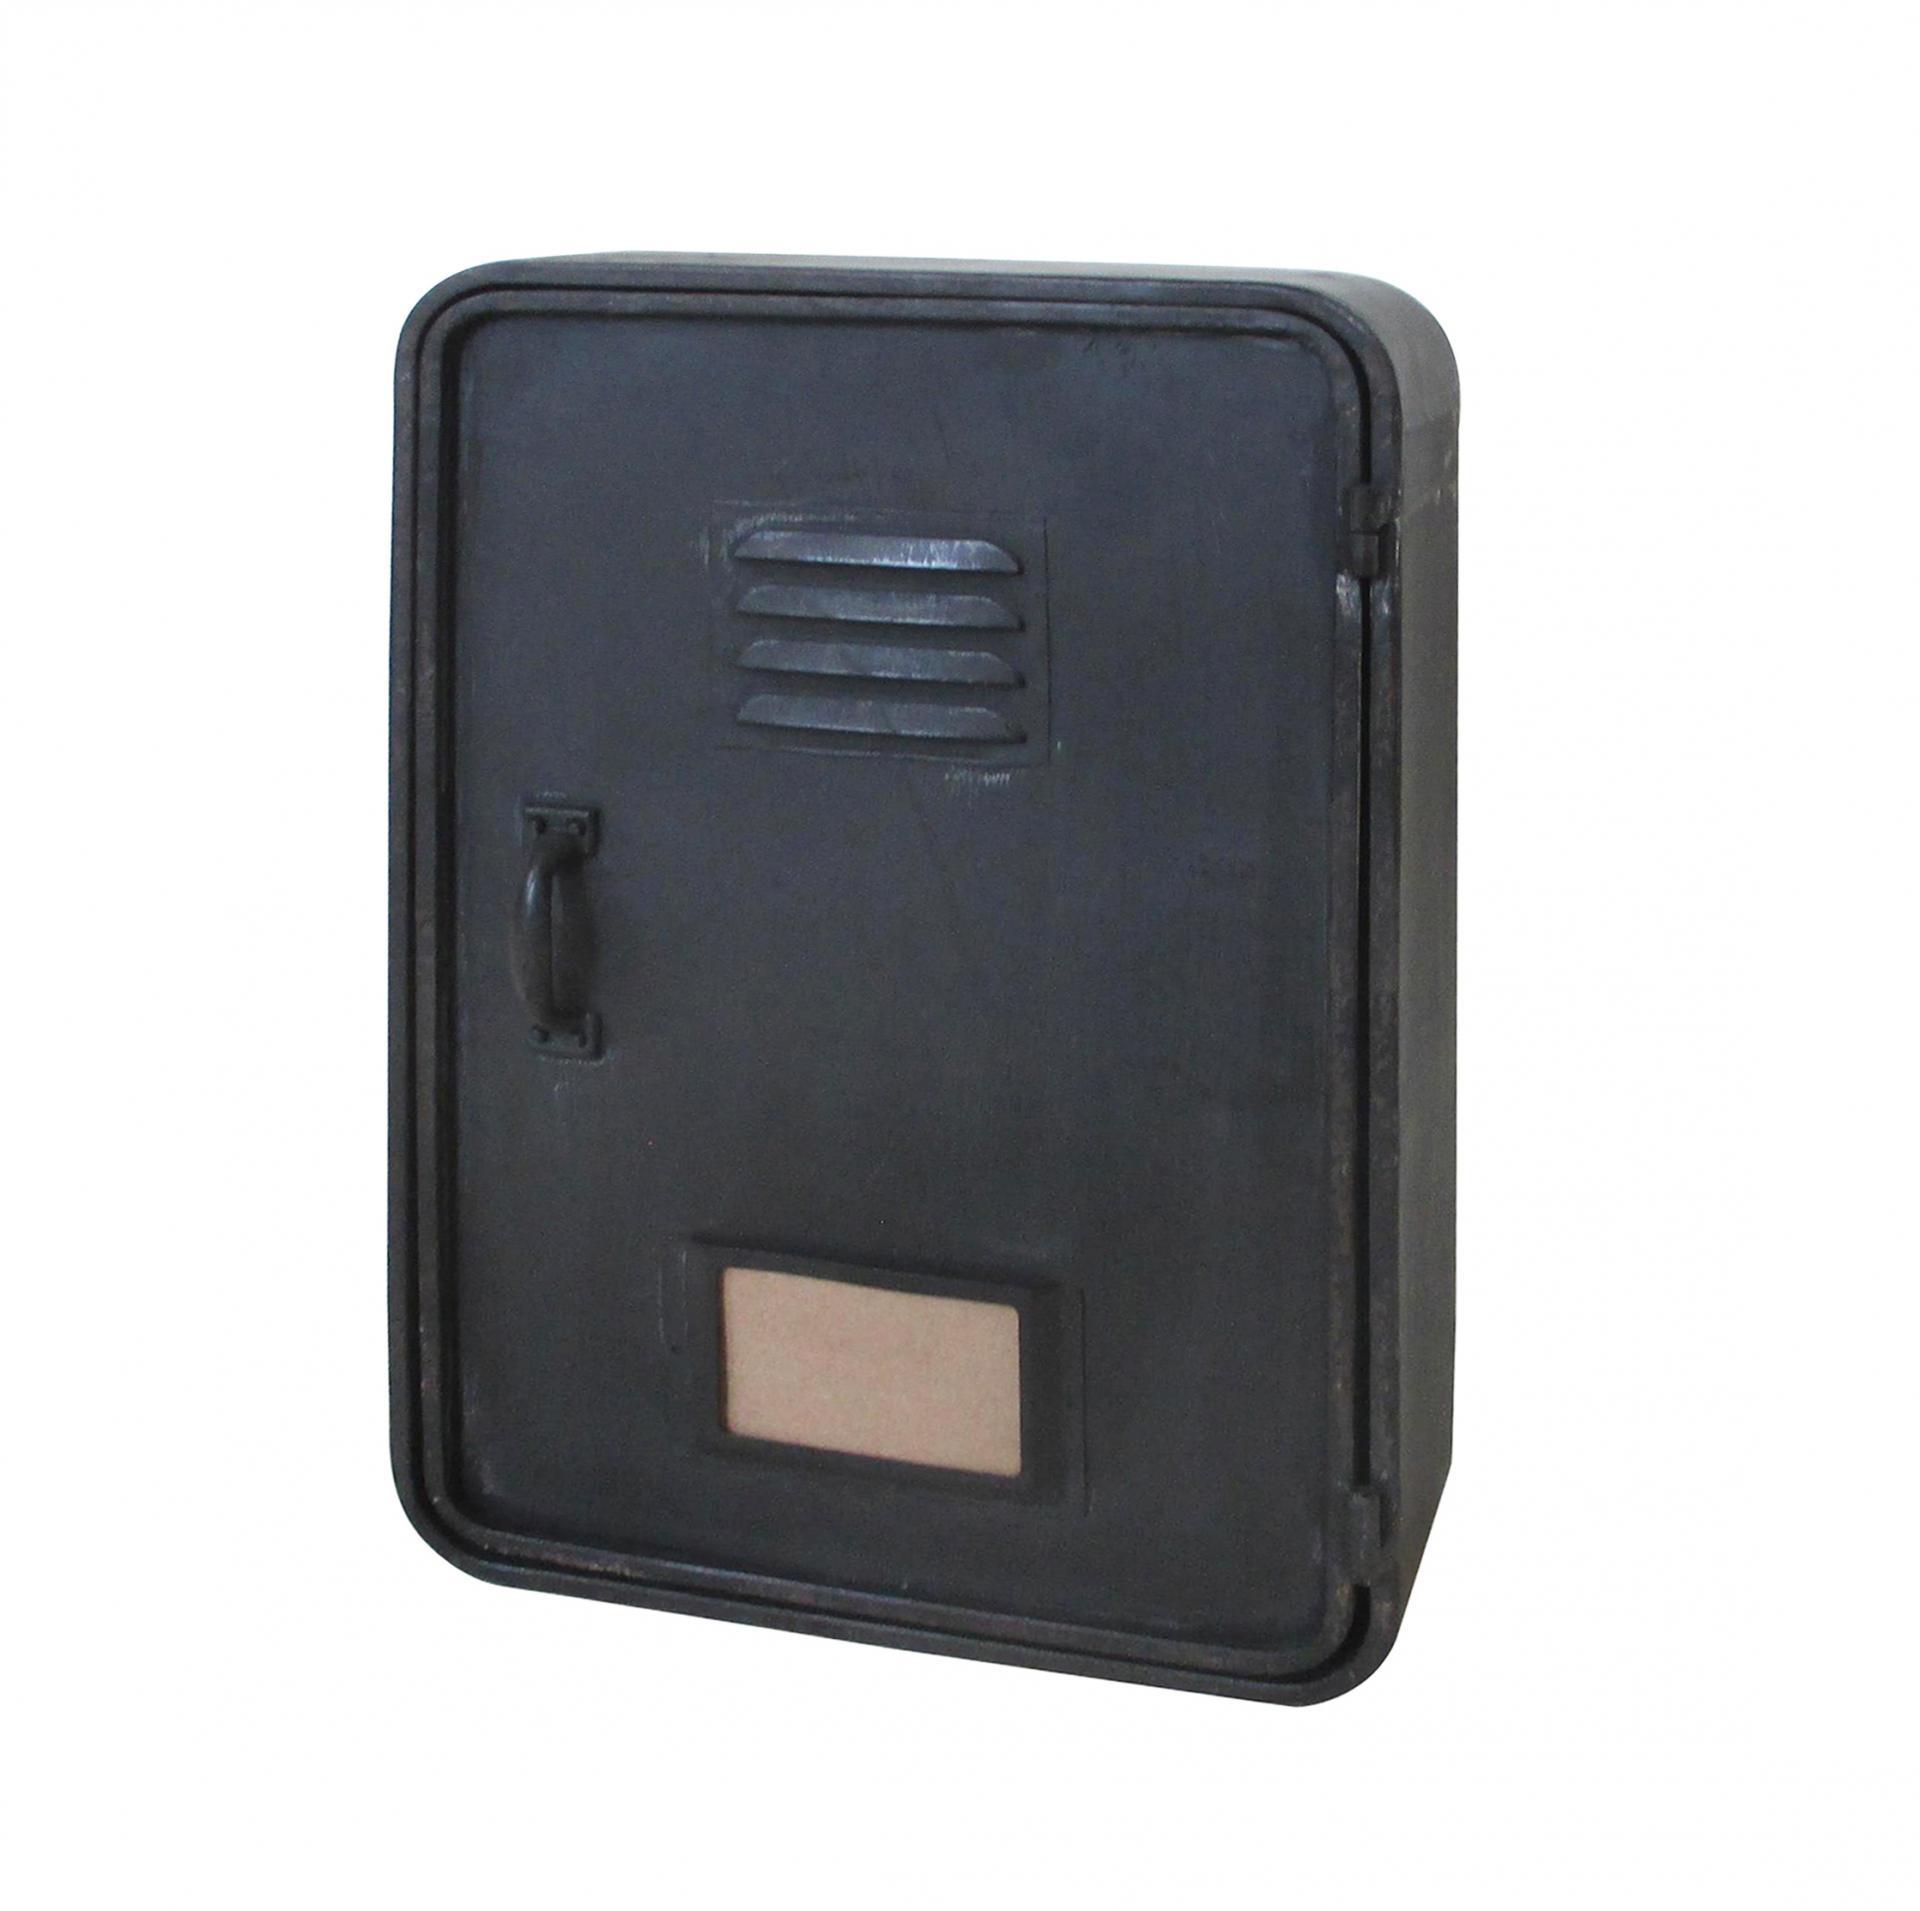 Chic Antique Skříňka na klíče Factory, černá barva, kov